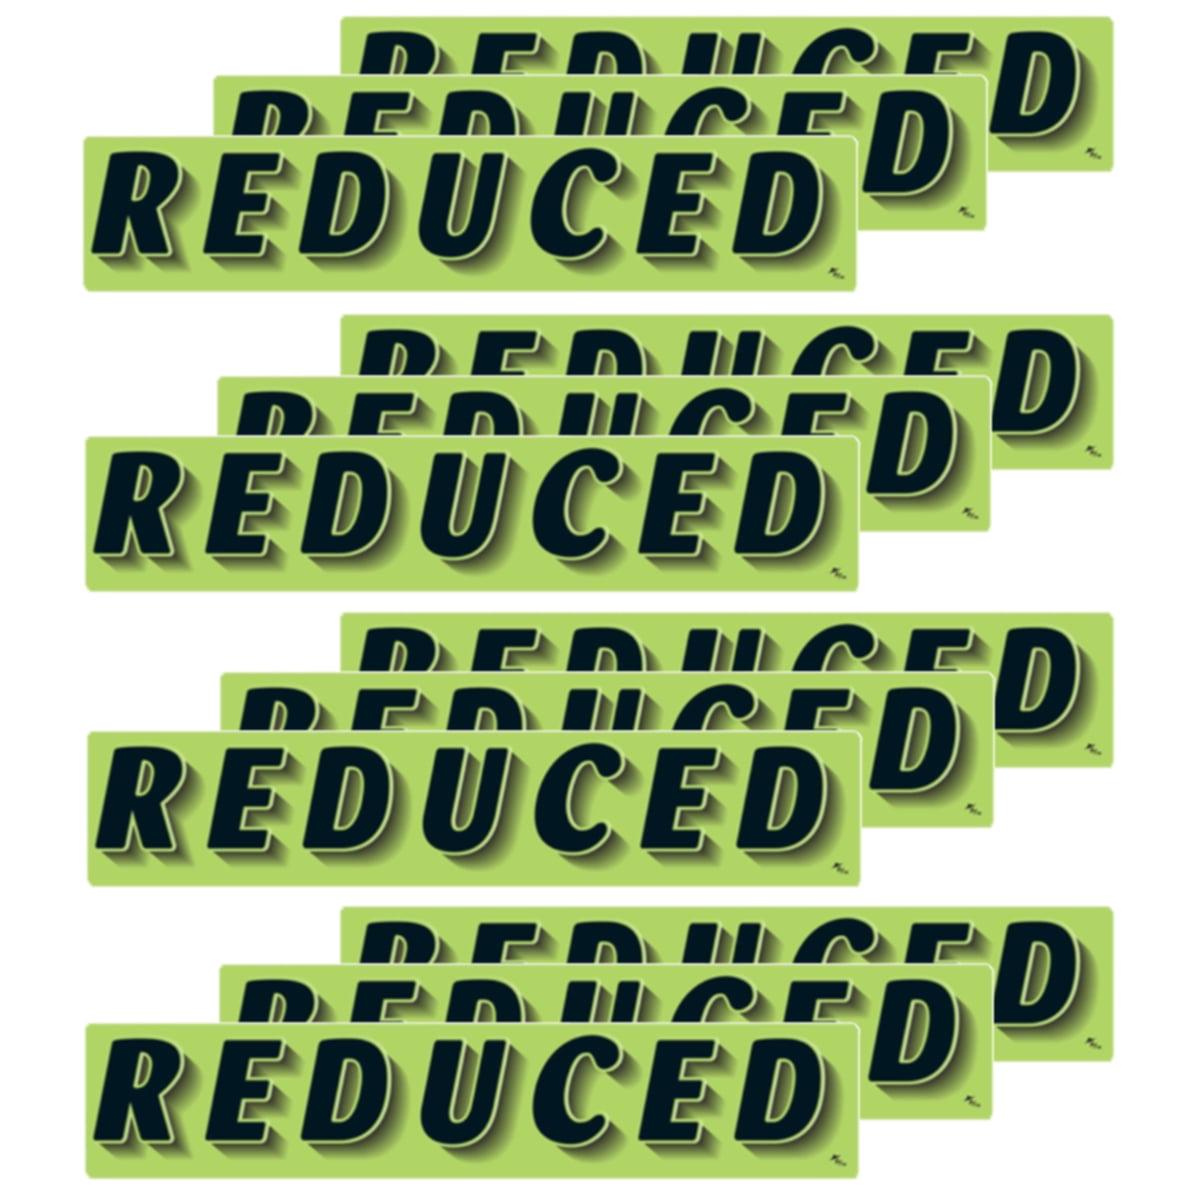 14.5 Inch Black /& Green Adhesive Windshield Slogan Car Dealer Sticker P/'S